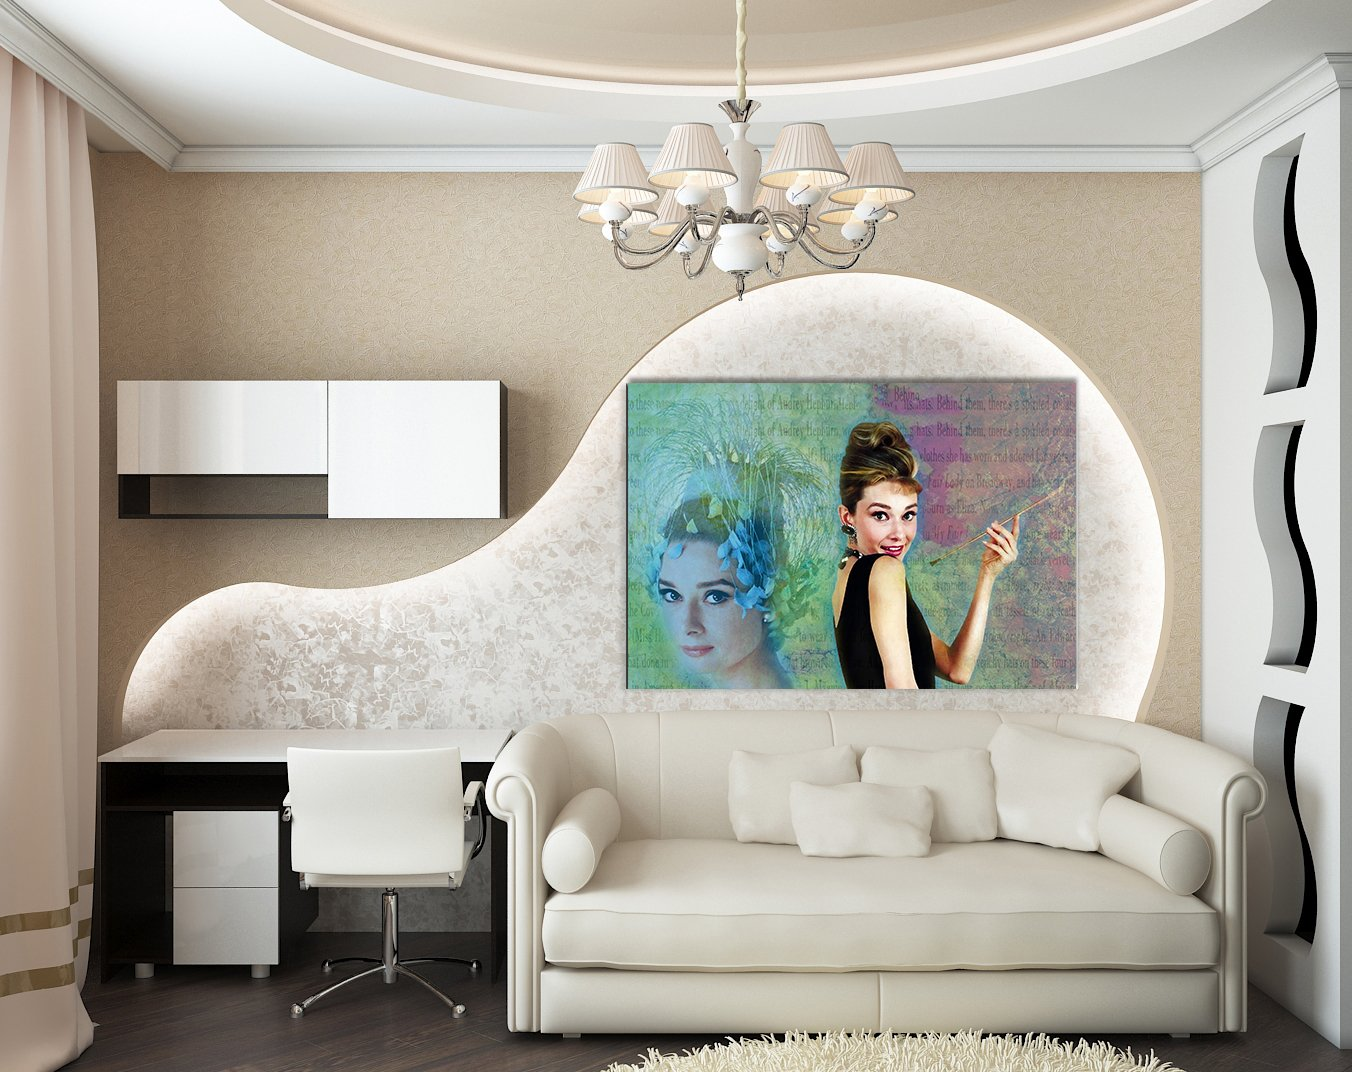 Julia-art Leinwandbilder - Audrey Bild Hepburn Model Icon Bild Audrey 1 teilig - 120 mal 80 cm Leinwand auf Rahmen - sofort aufhängbar   Wandbild XXL - Kunstdrucke QN.164-6 8fb585